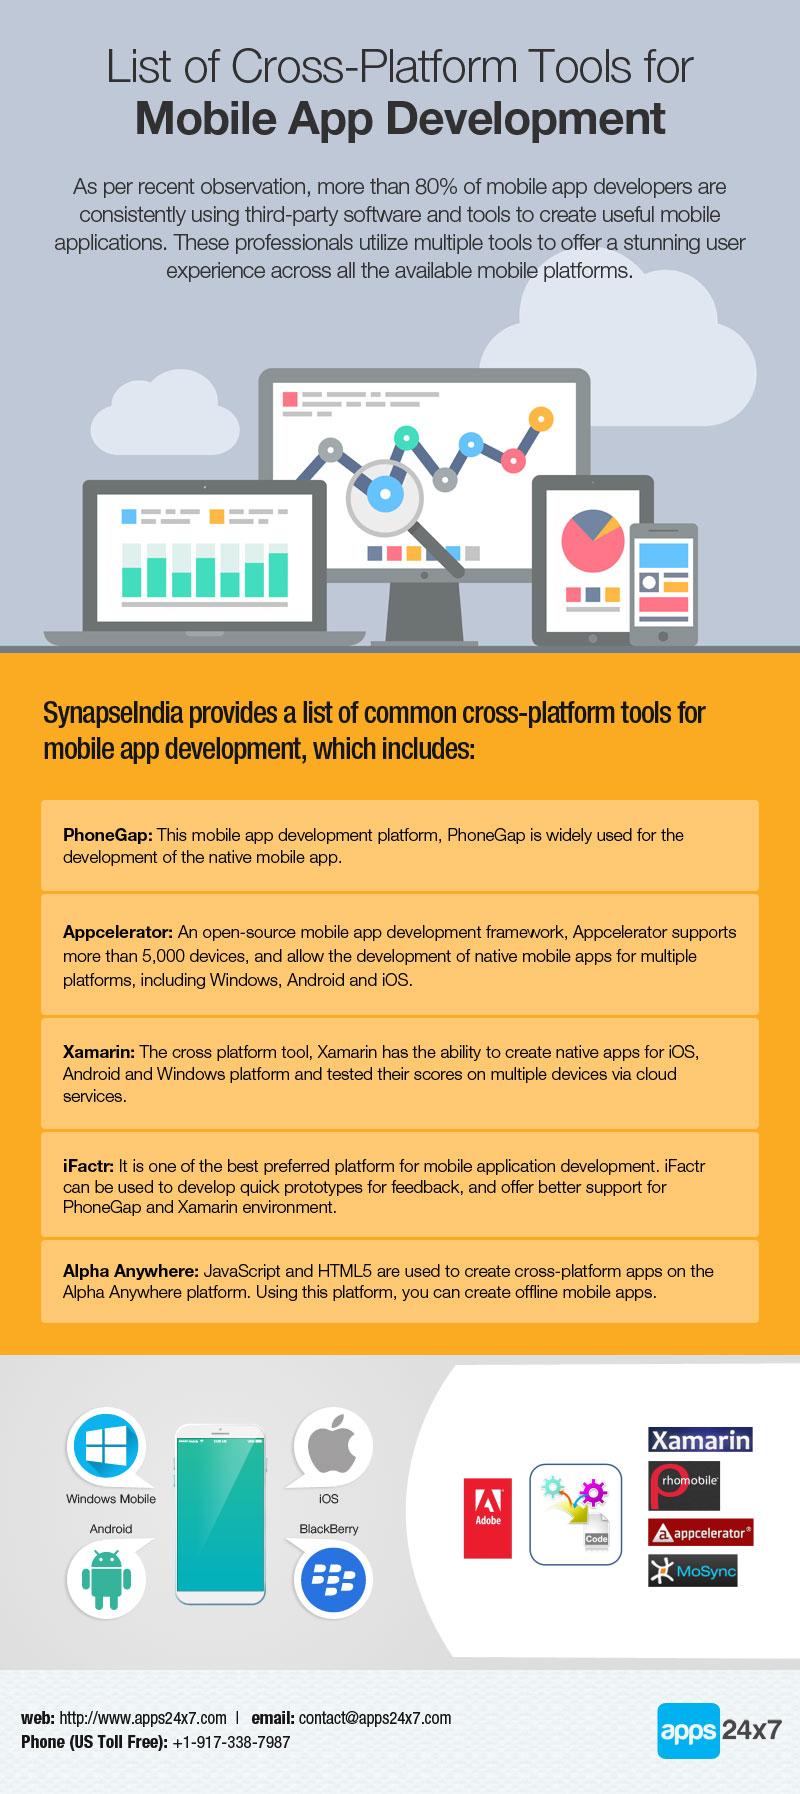 List of Cross platform tools for Mobile App Development - by